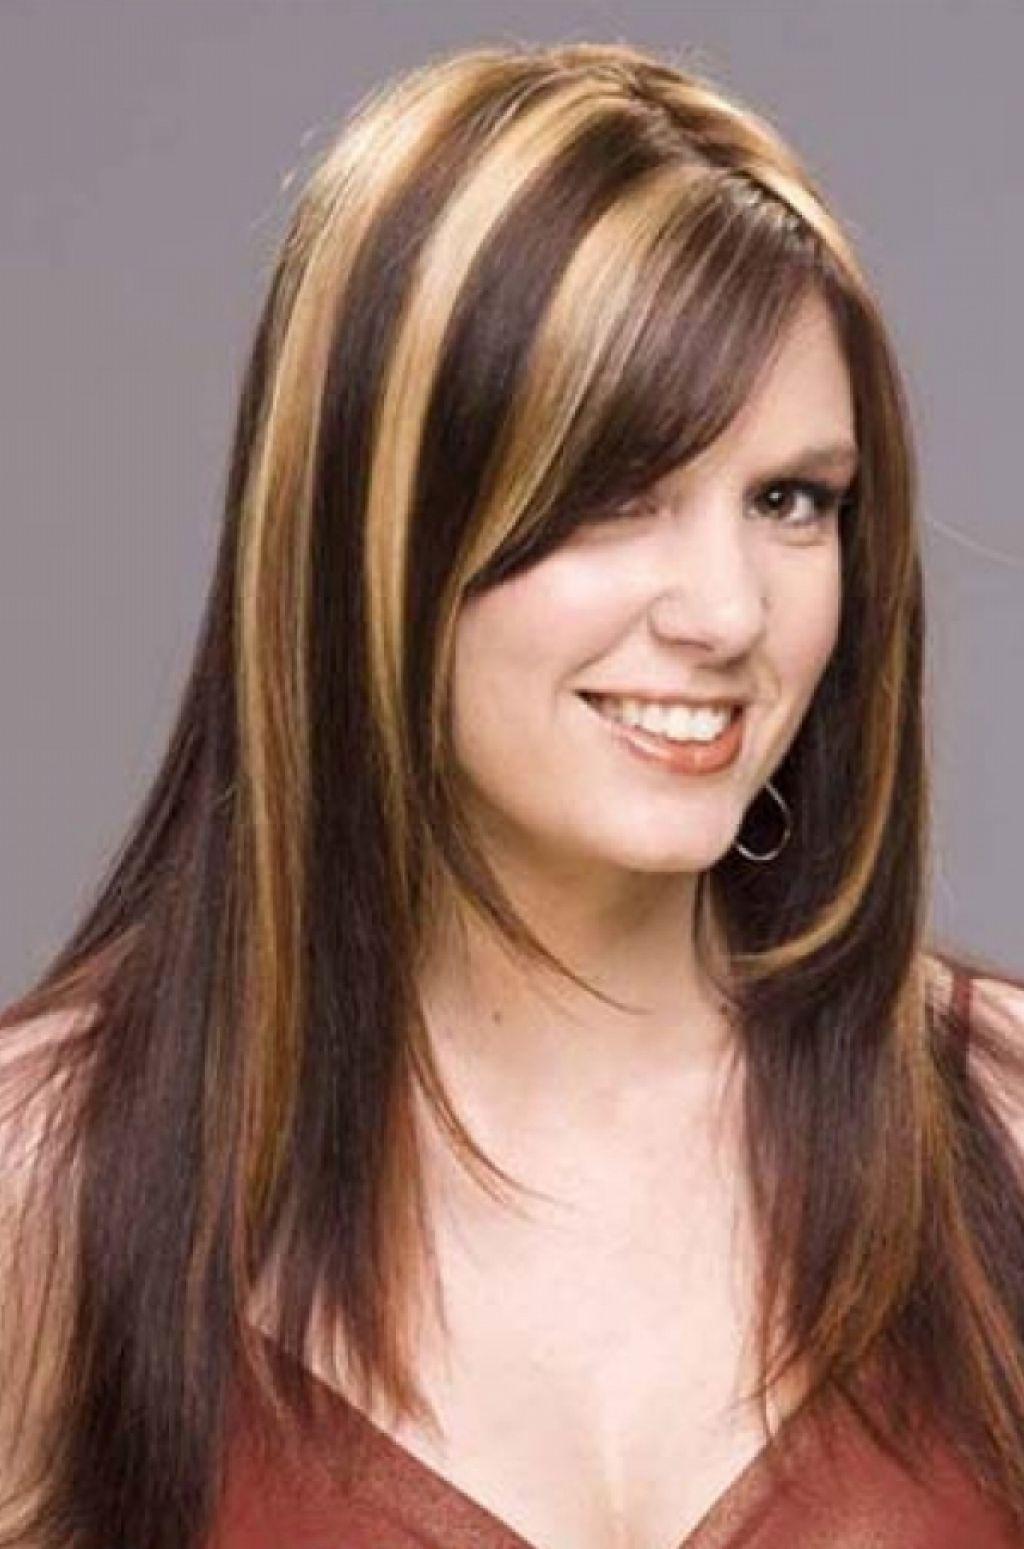 highlight ideas for brown hair color inspiring ideas pinterest - Hair Color Highlights Styles